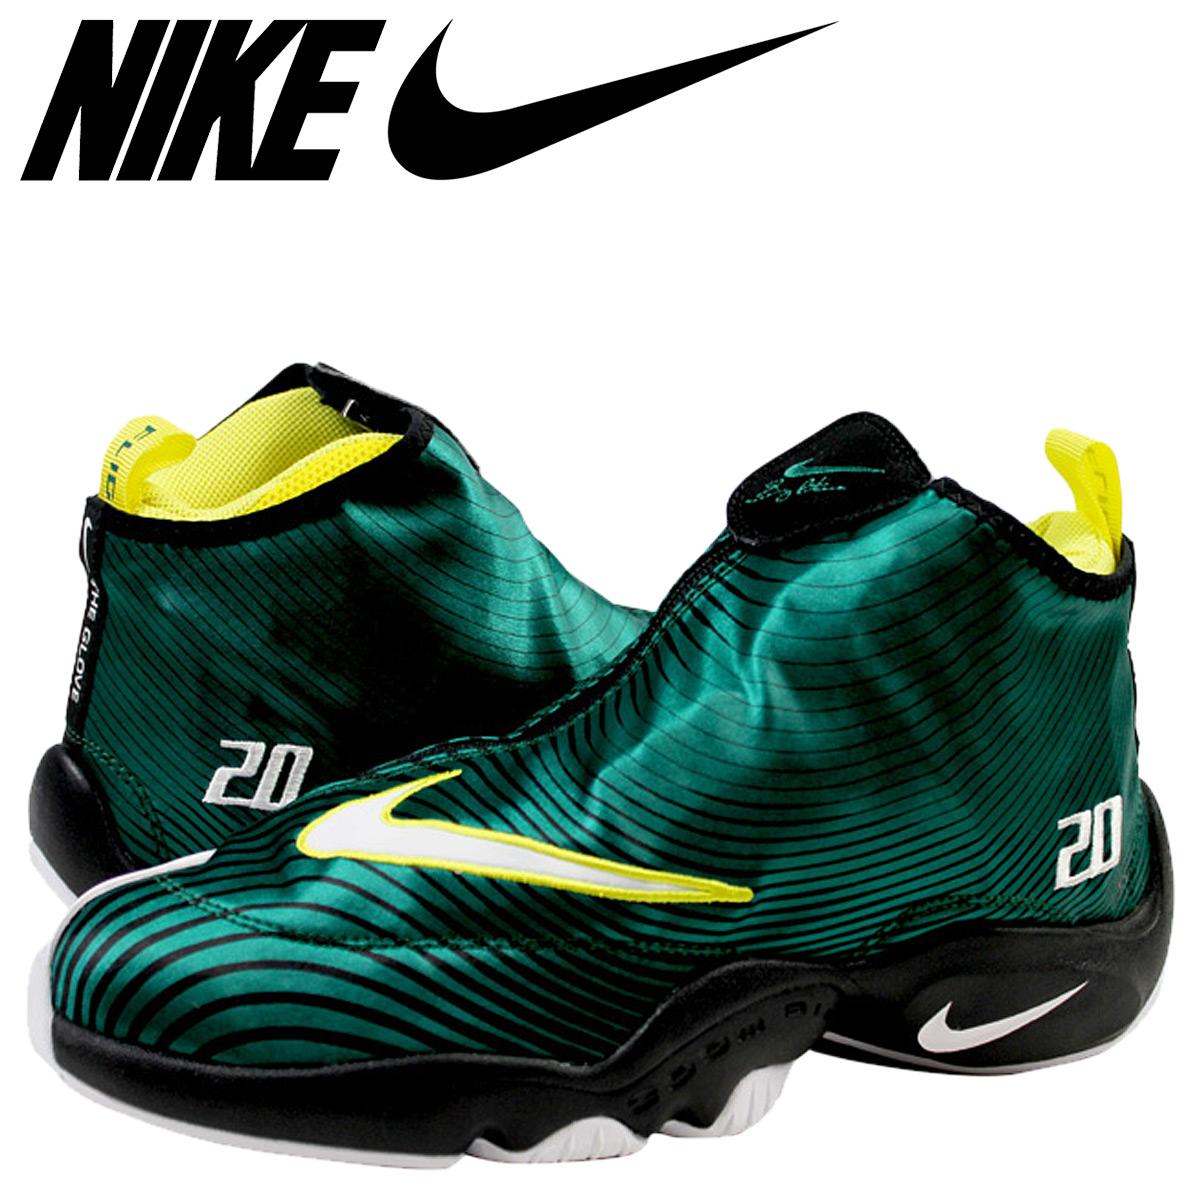 d03c7beb2835 Nike NIKE Air Zoom flight sneaker AIR ZOOM FLIGHT THE GLOVE QS SC AFII the  globe 630773-300 green mens